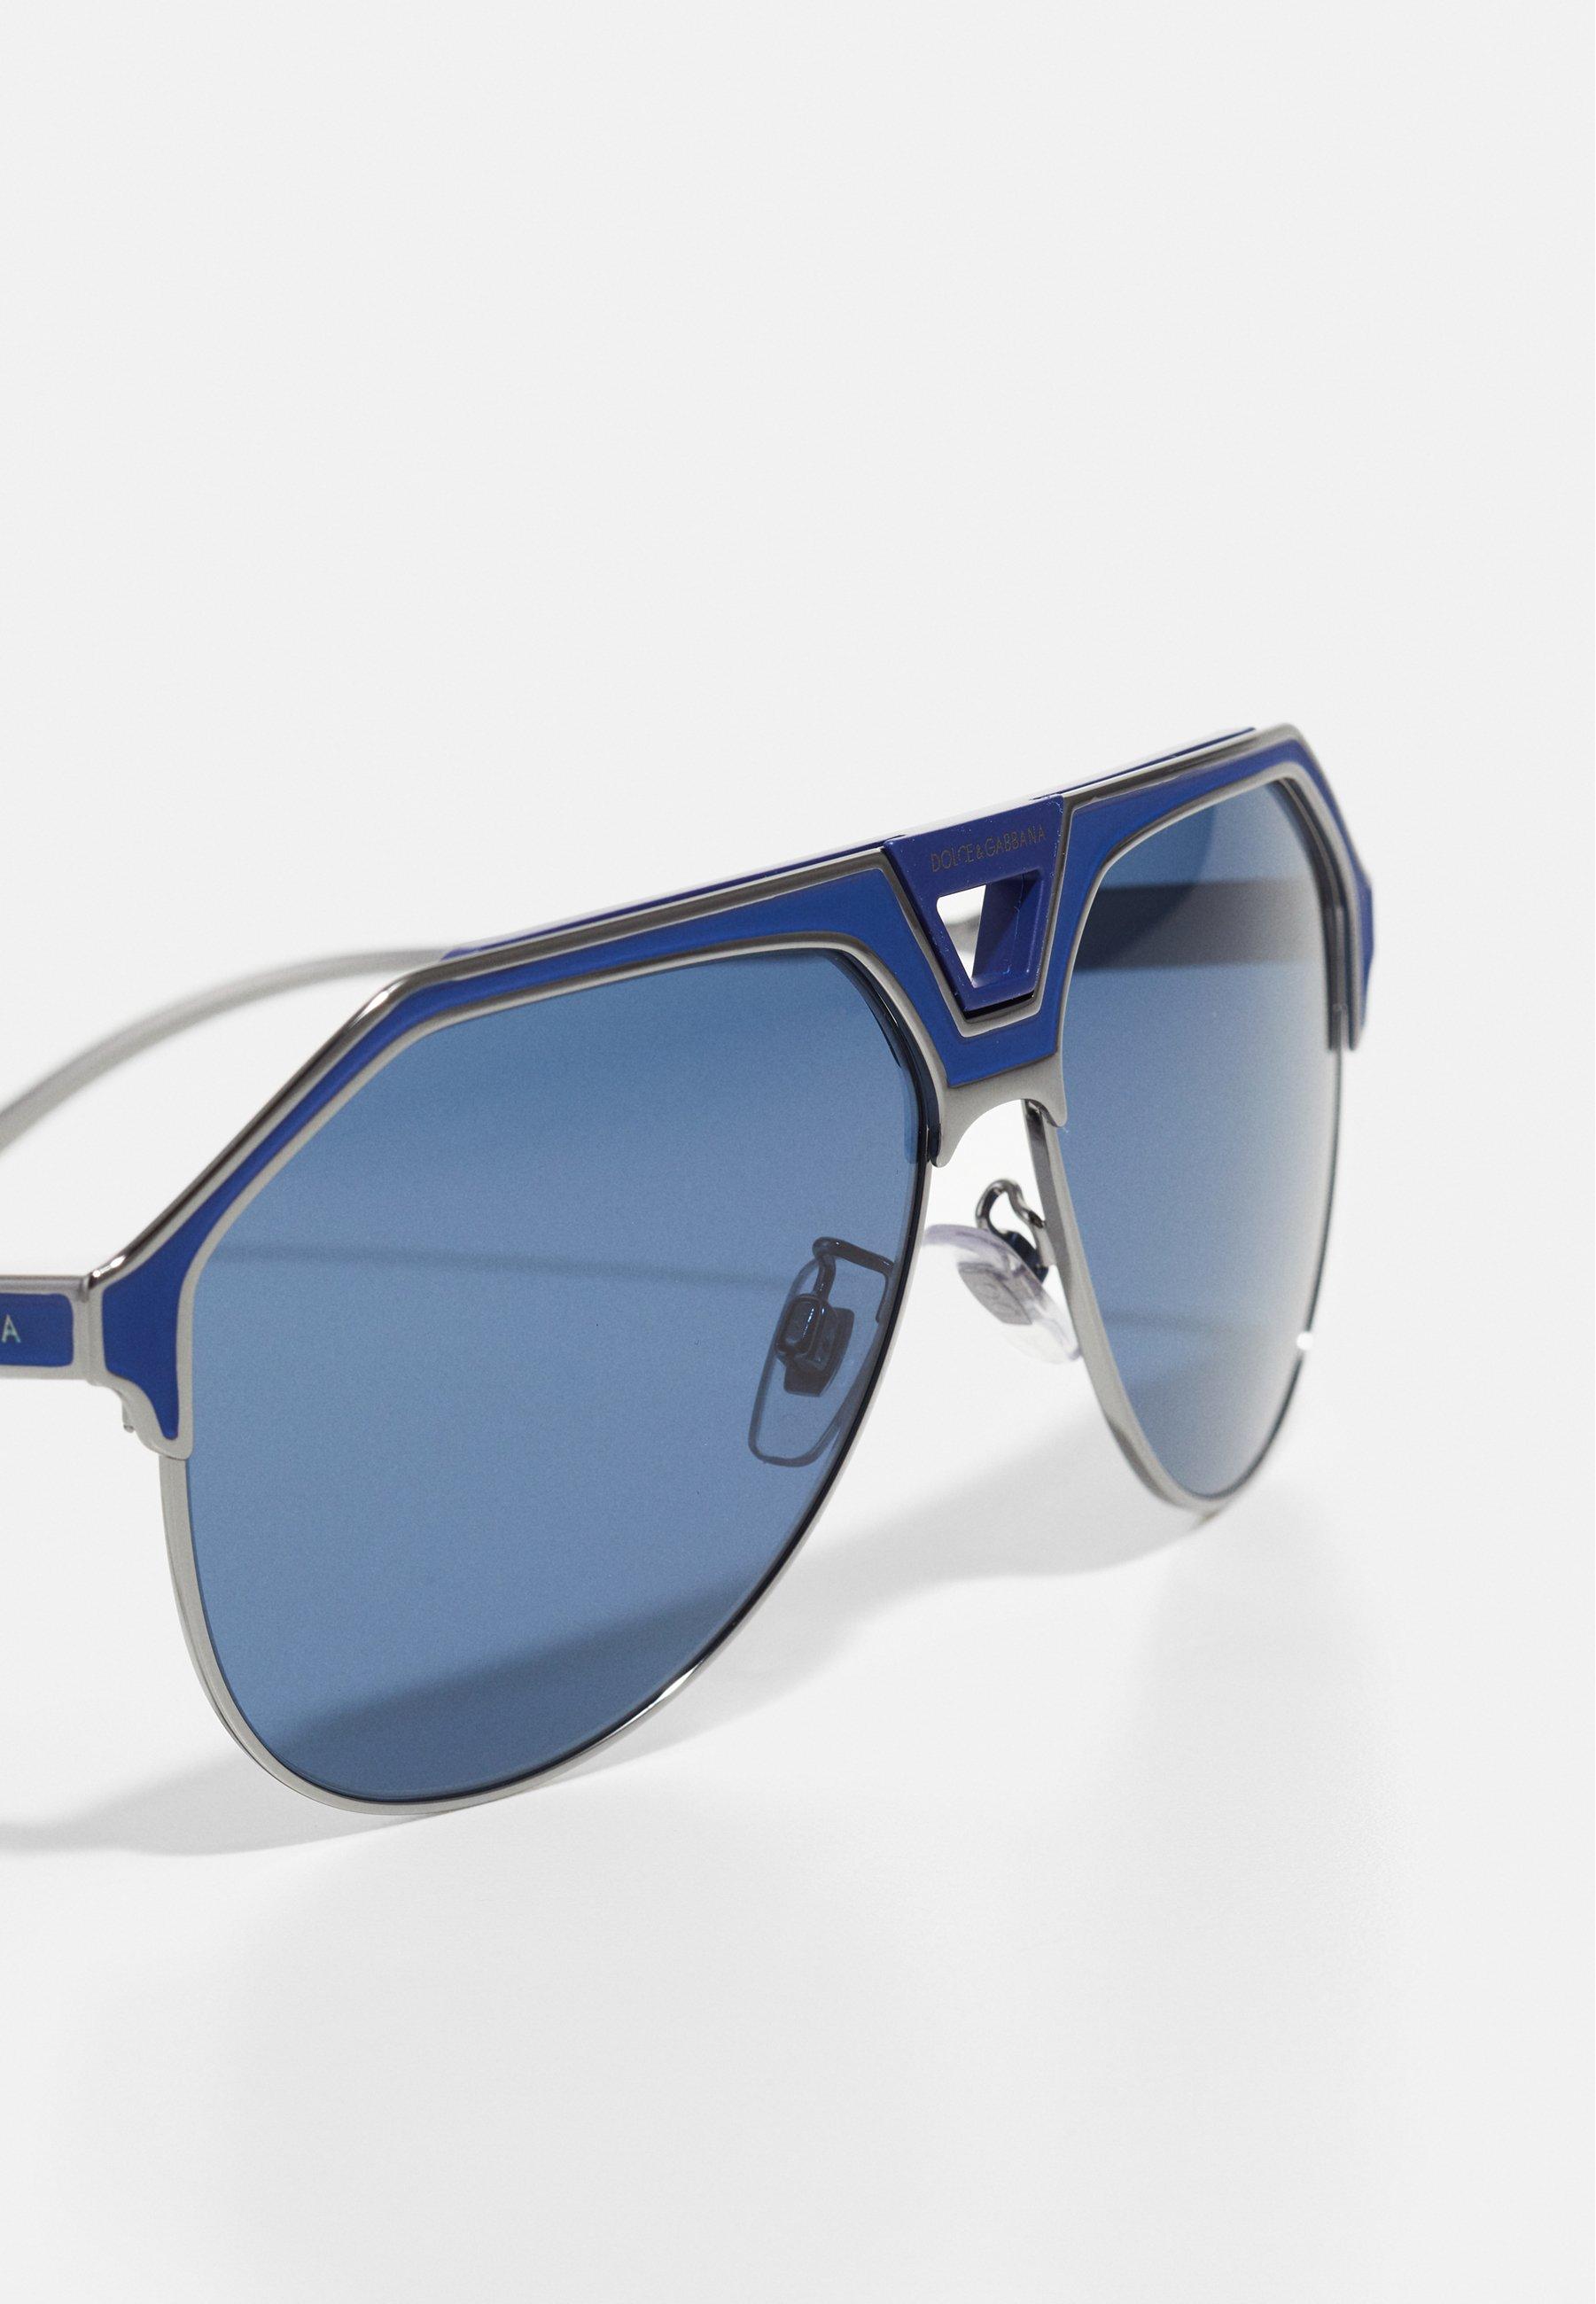 Dolce&Gabbana Solbriller - gunmetal/blue matte/gunmetall fzFbuGBNWHooRVv